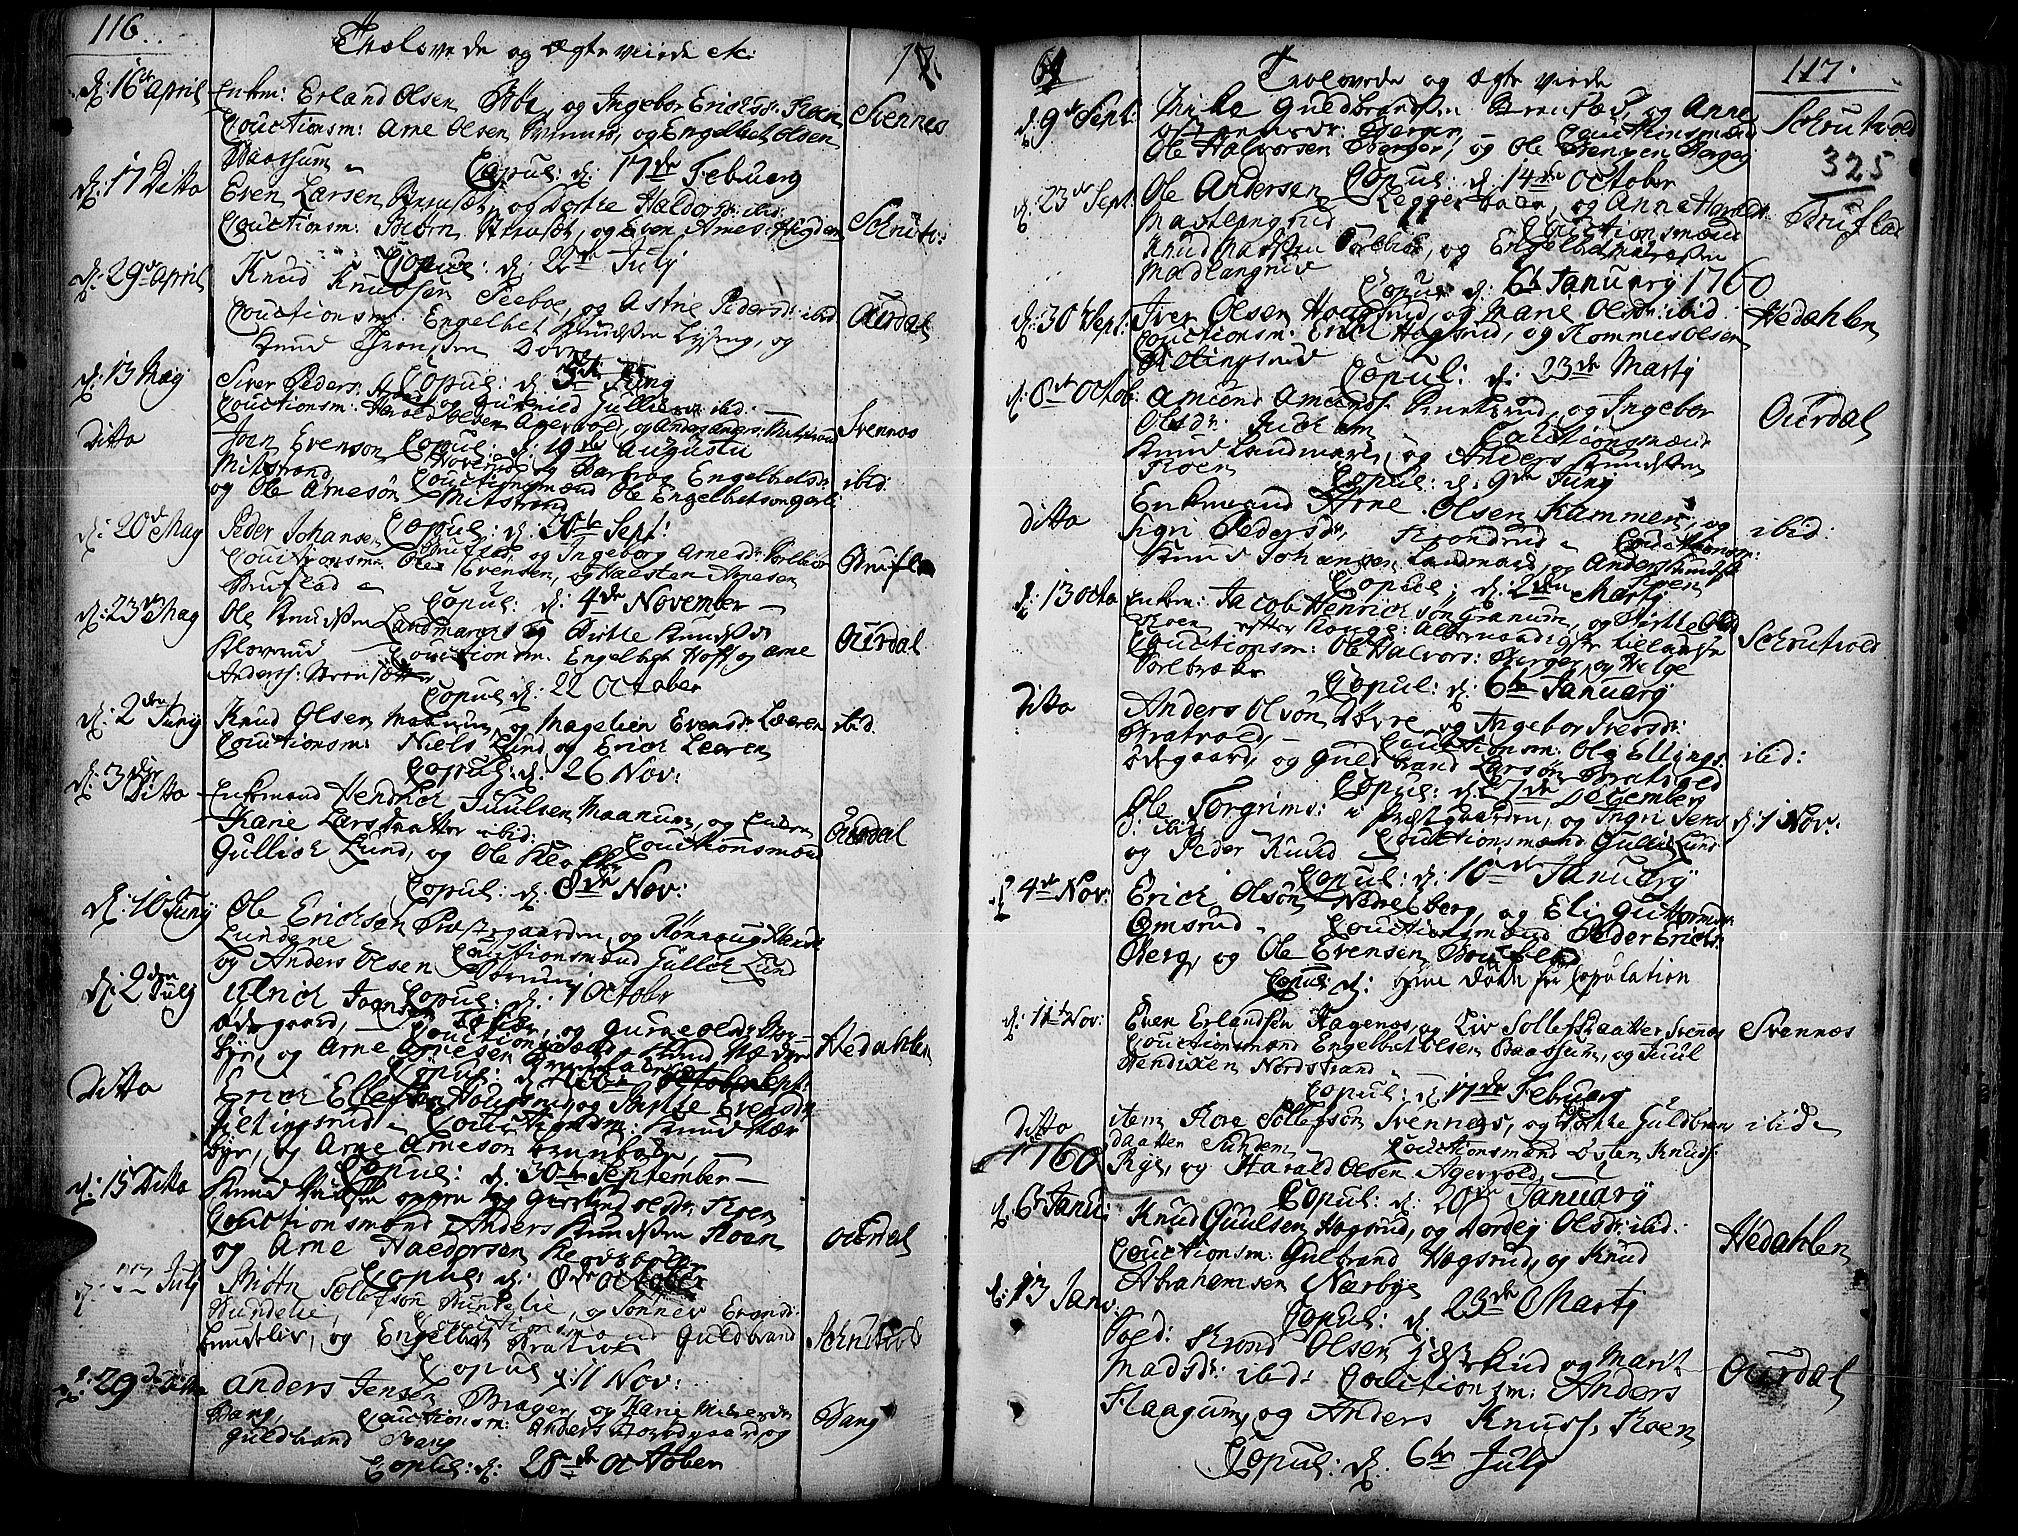 SAH, Aurdal prestekontor, Ministerialbok nr. 4, 1730-1762, s. 116-117